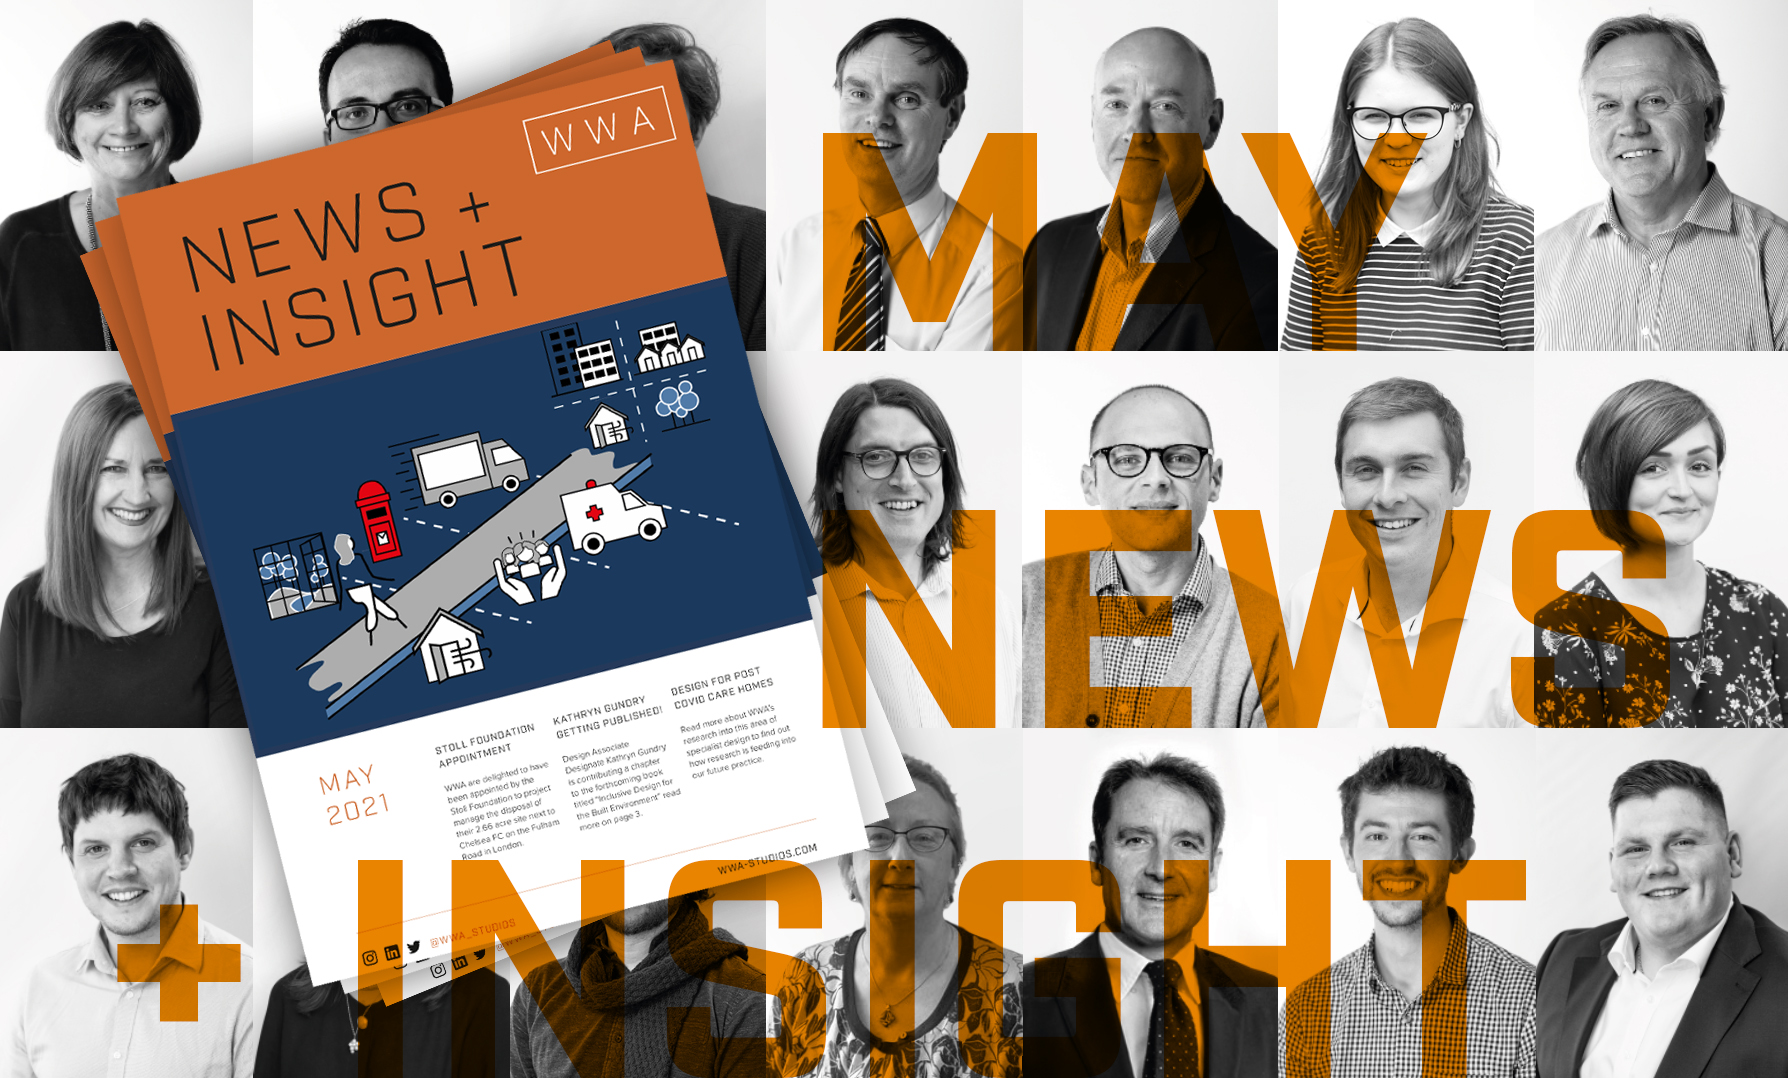 May 2021, Newsletter, News, News + Insights, WWA Studios, WWA, West Waddy Archadia, West Waddy, Archadia, Architecture, Urban Design, Town Planning